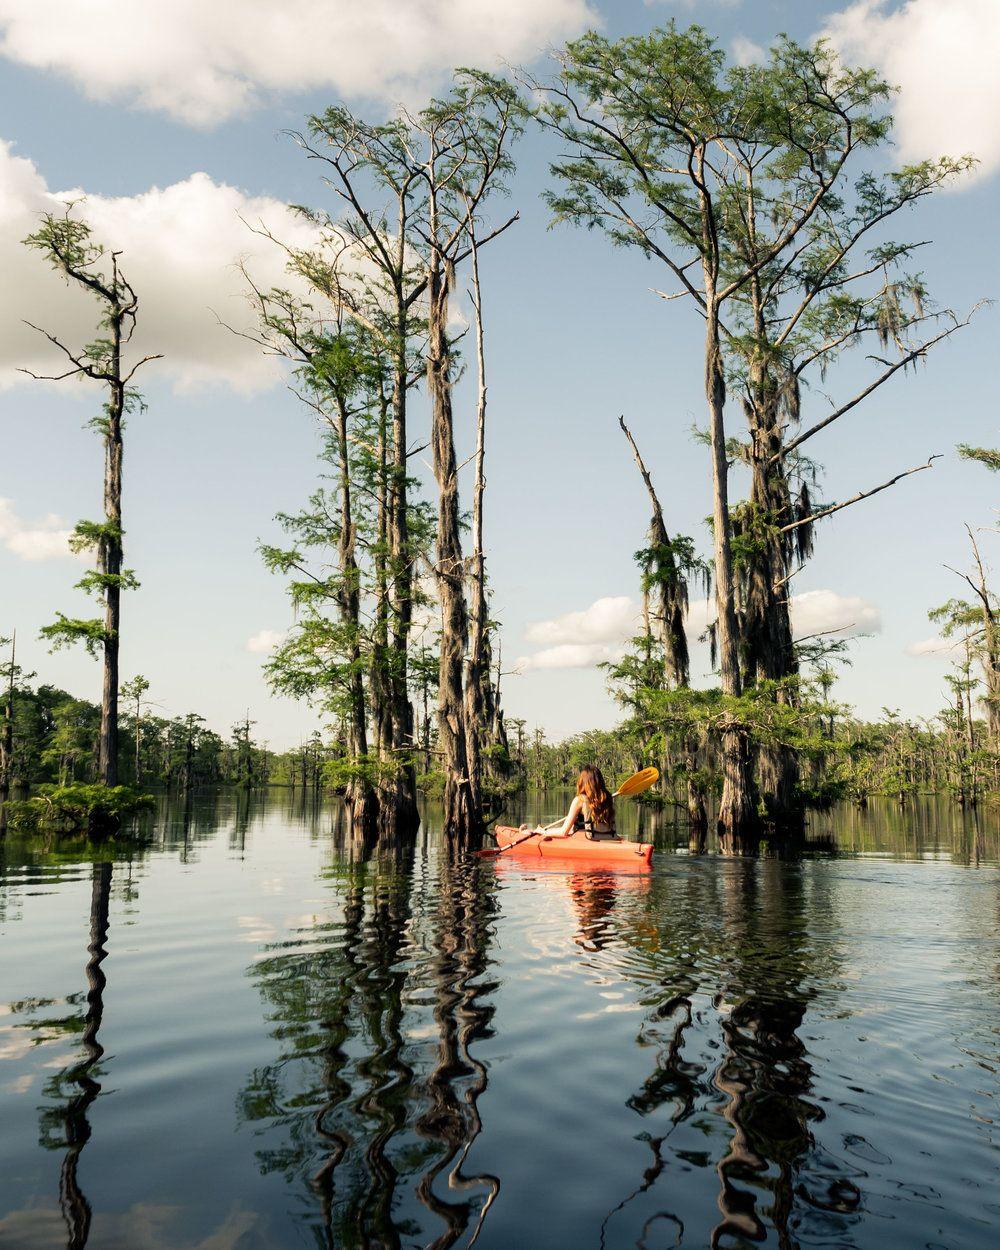 Louisiana bayou monroe la louisiana photography